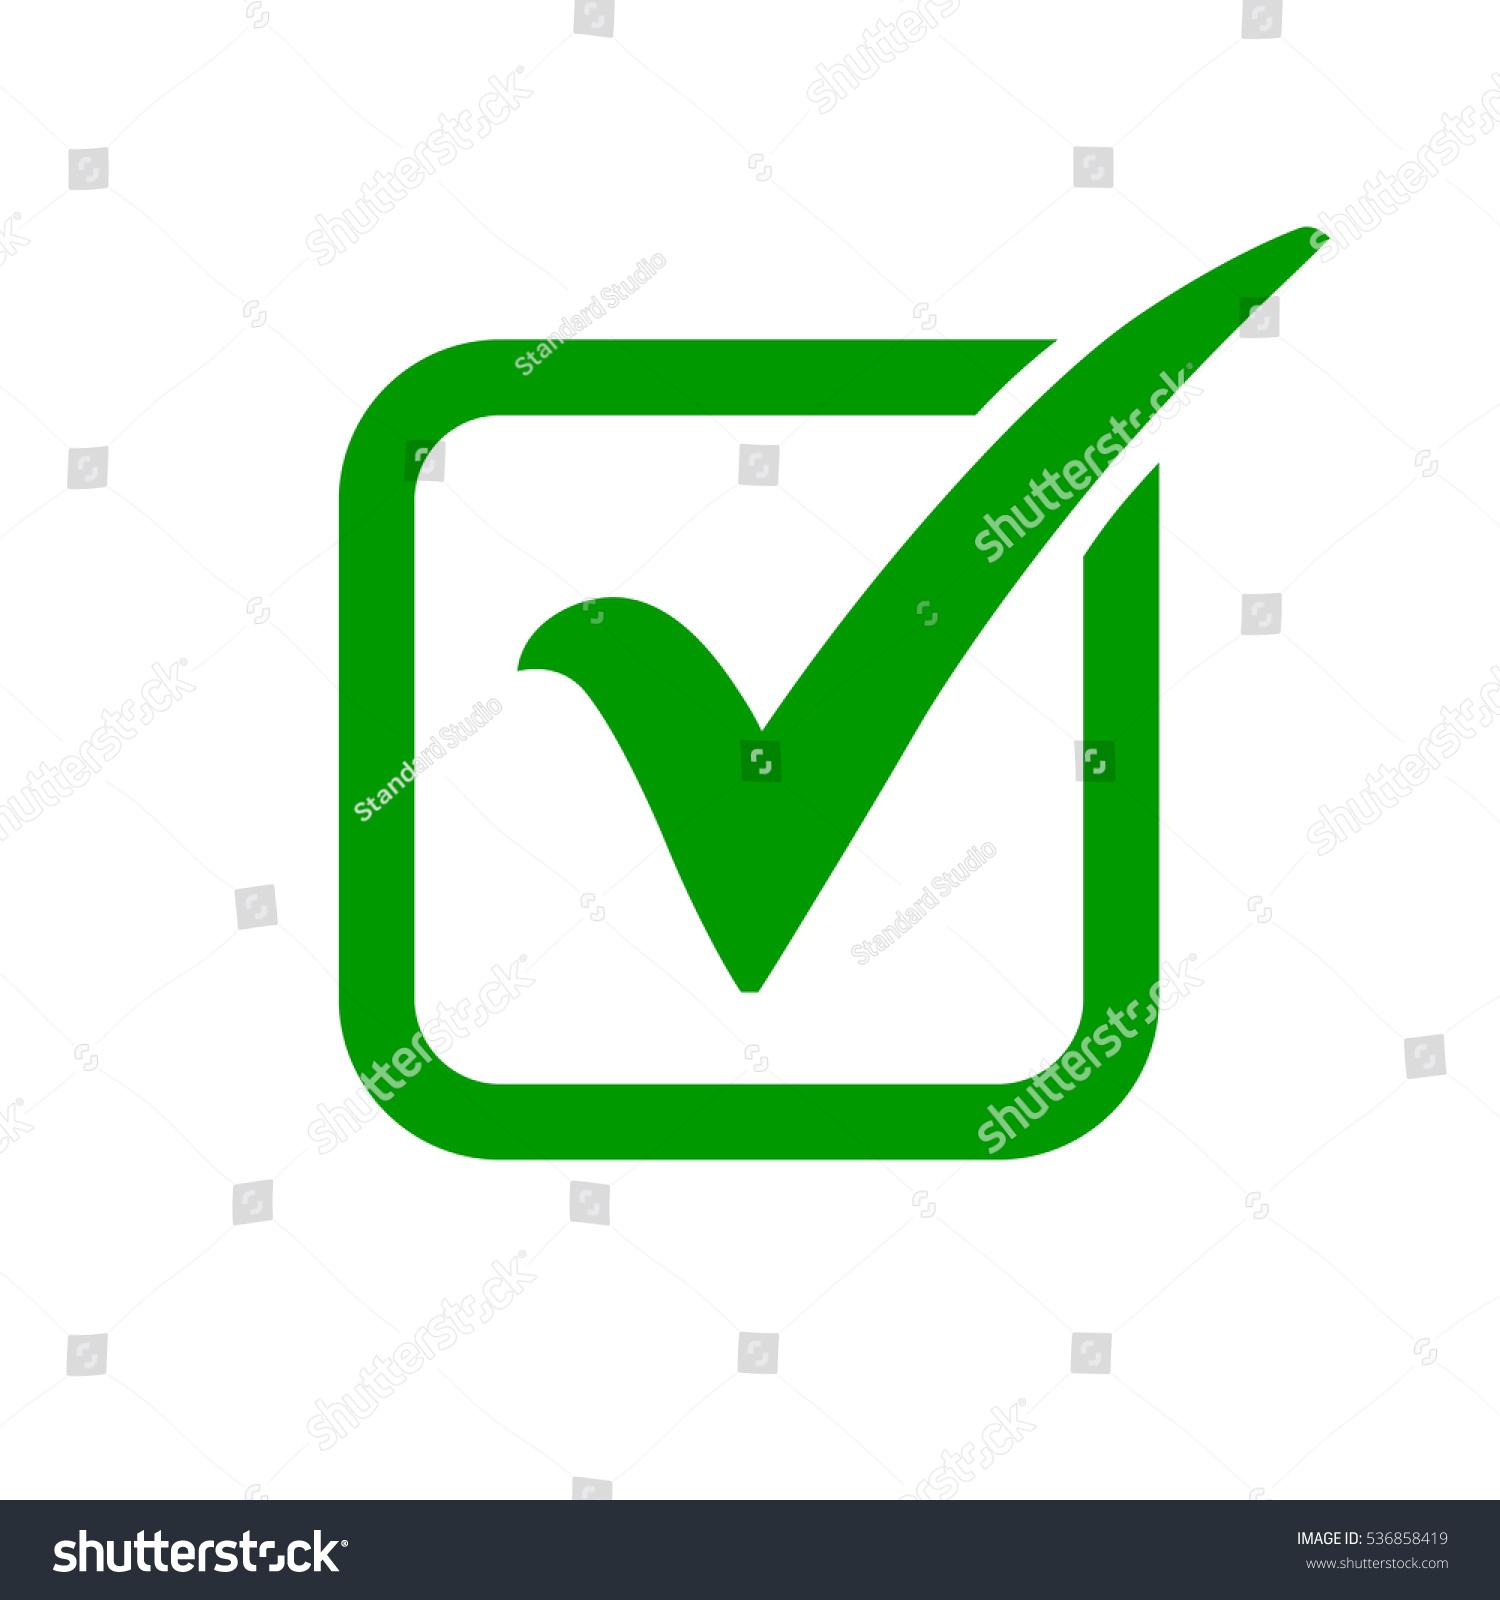 Green check mark icon box tick stock vector 536858419 shutterstock green check mark icon in a box tick symbol in green color vector illustration biocorpaavc Gallery